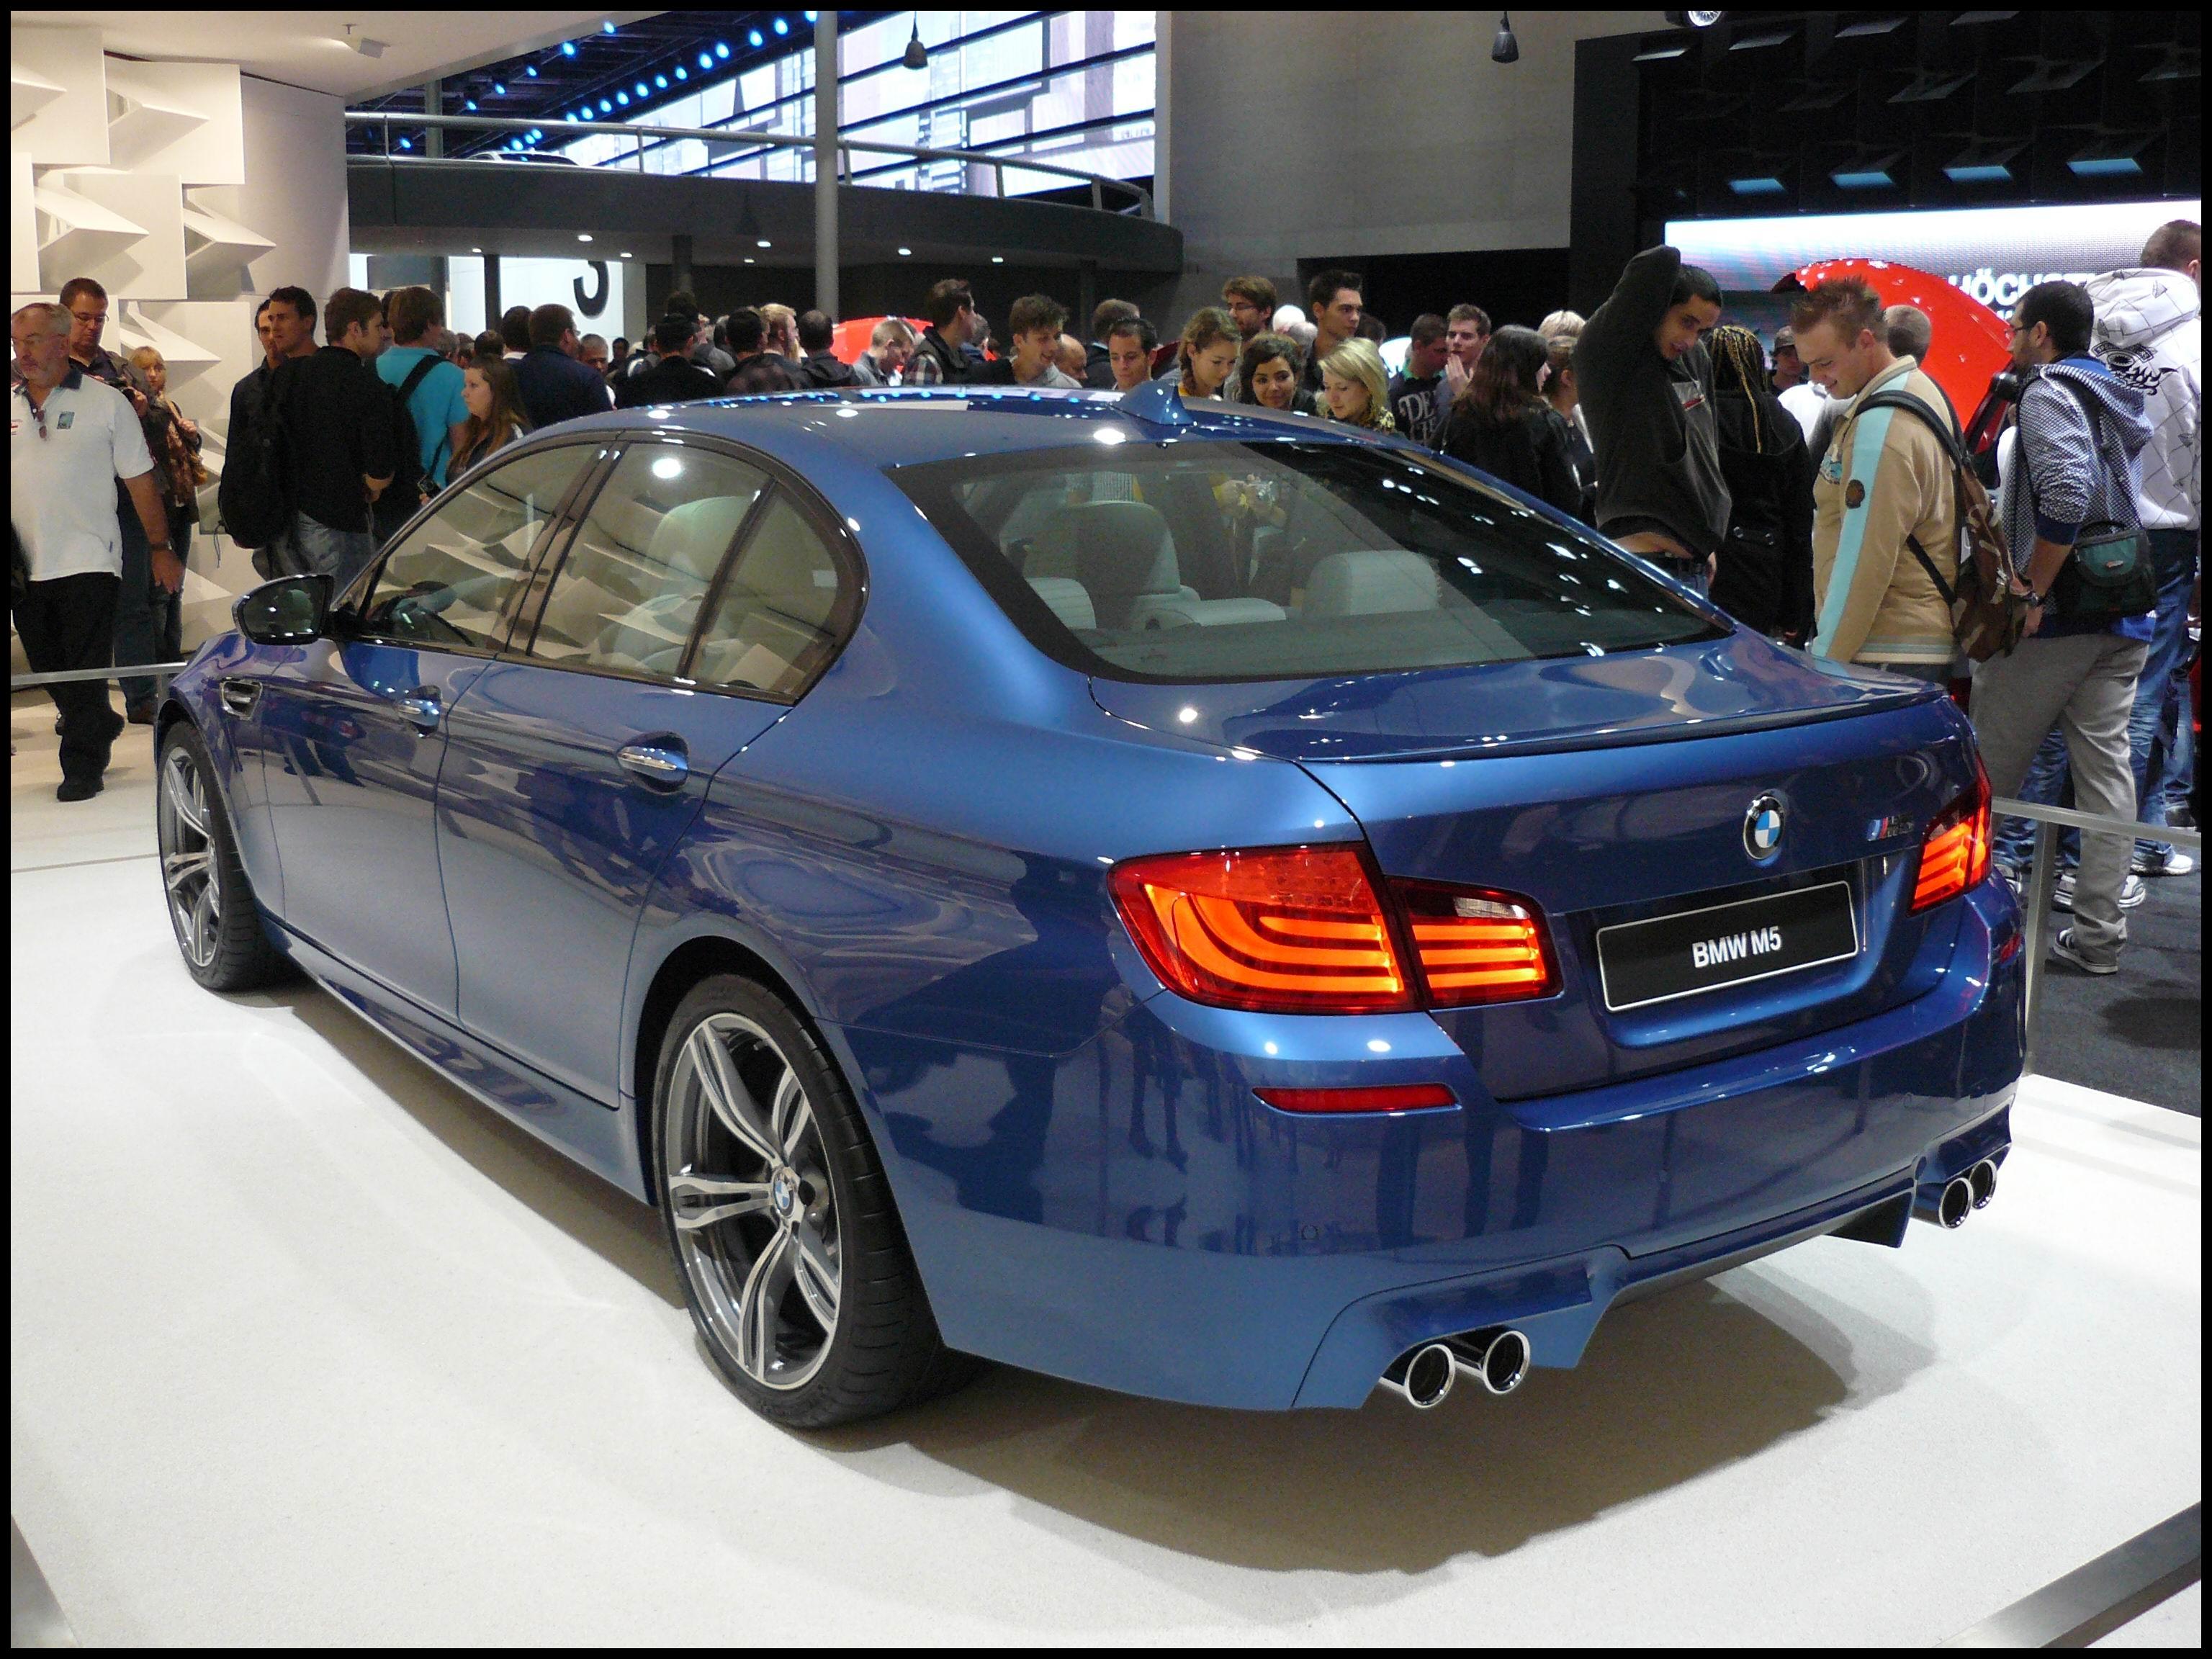 File BMW M5 2011 JPG